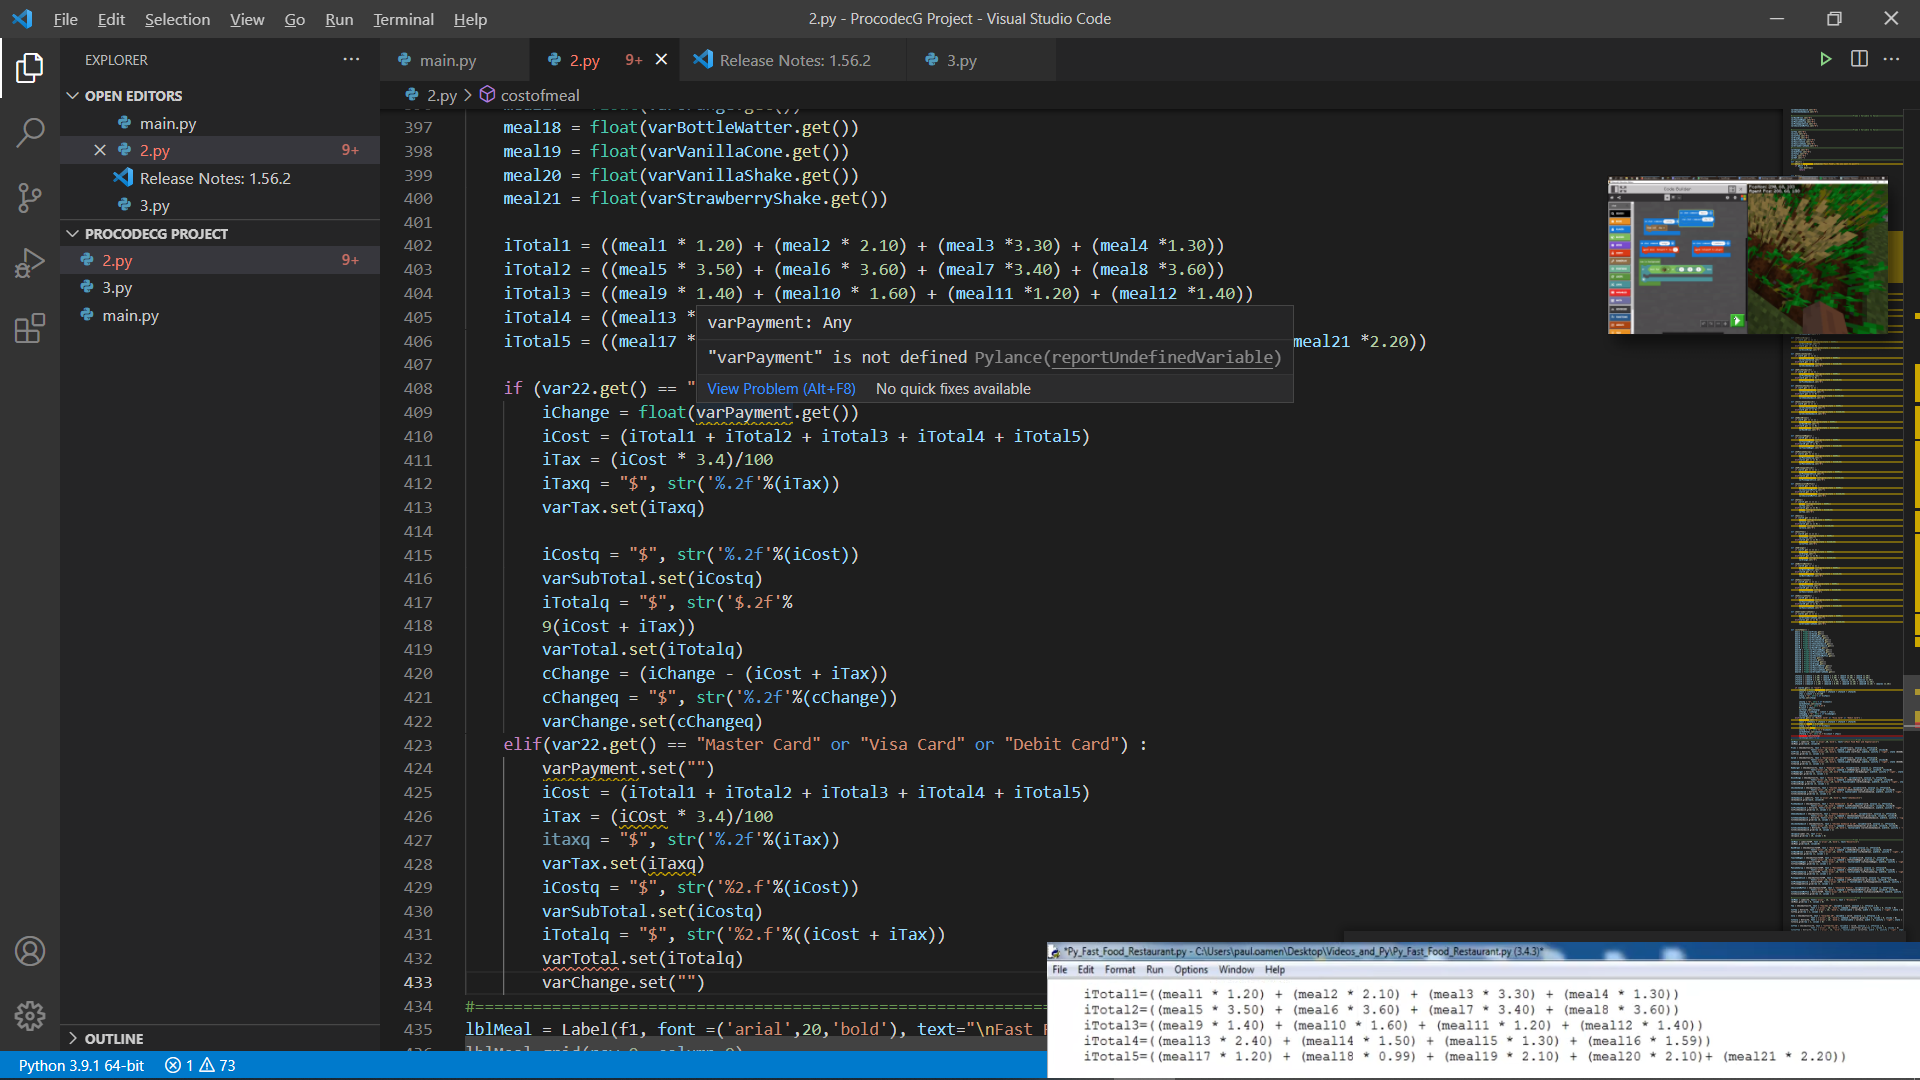 Desktop Screenshot 2021.05.29 - 11.59.33.81